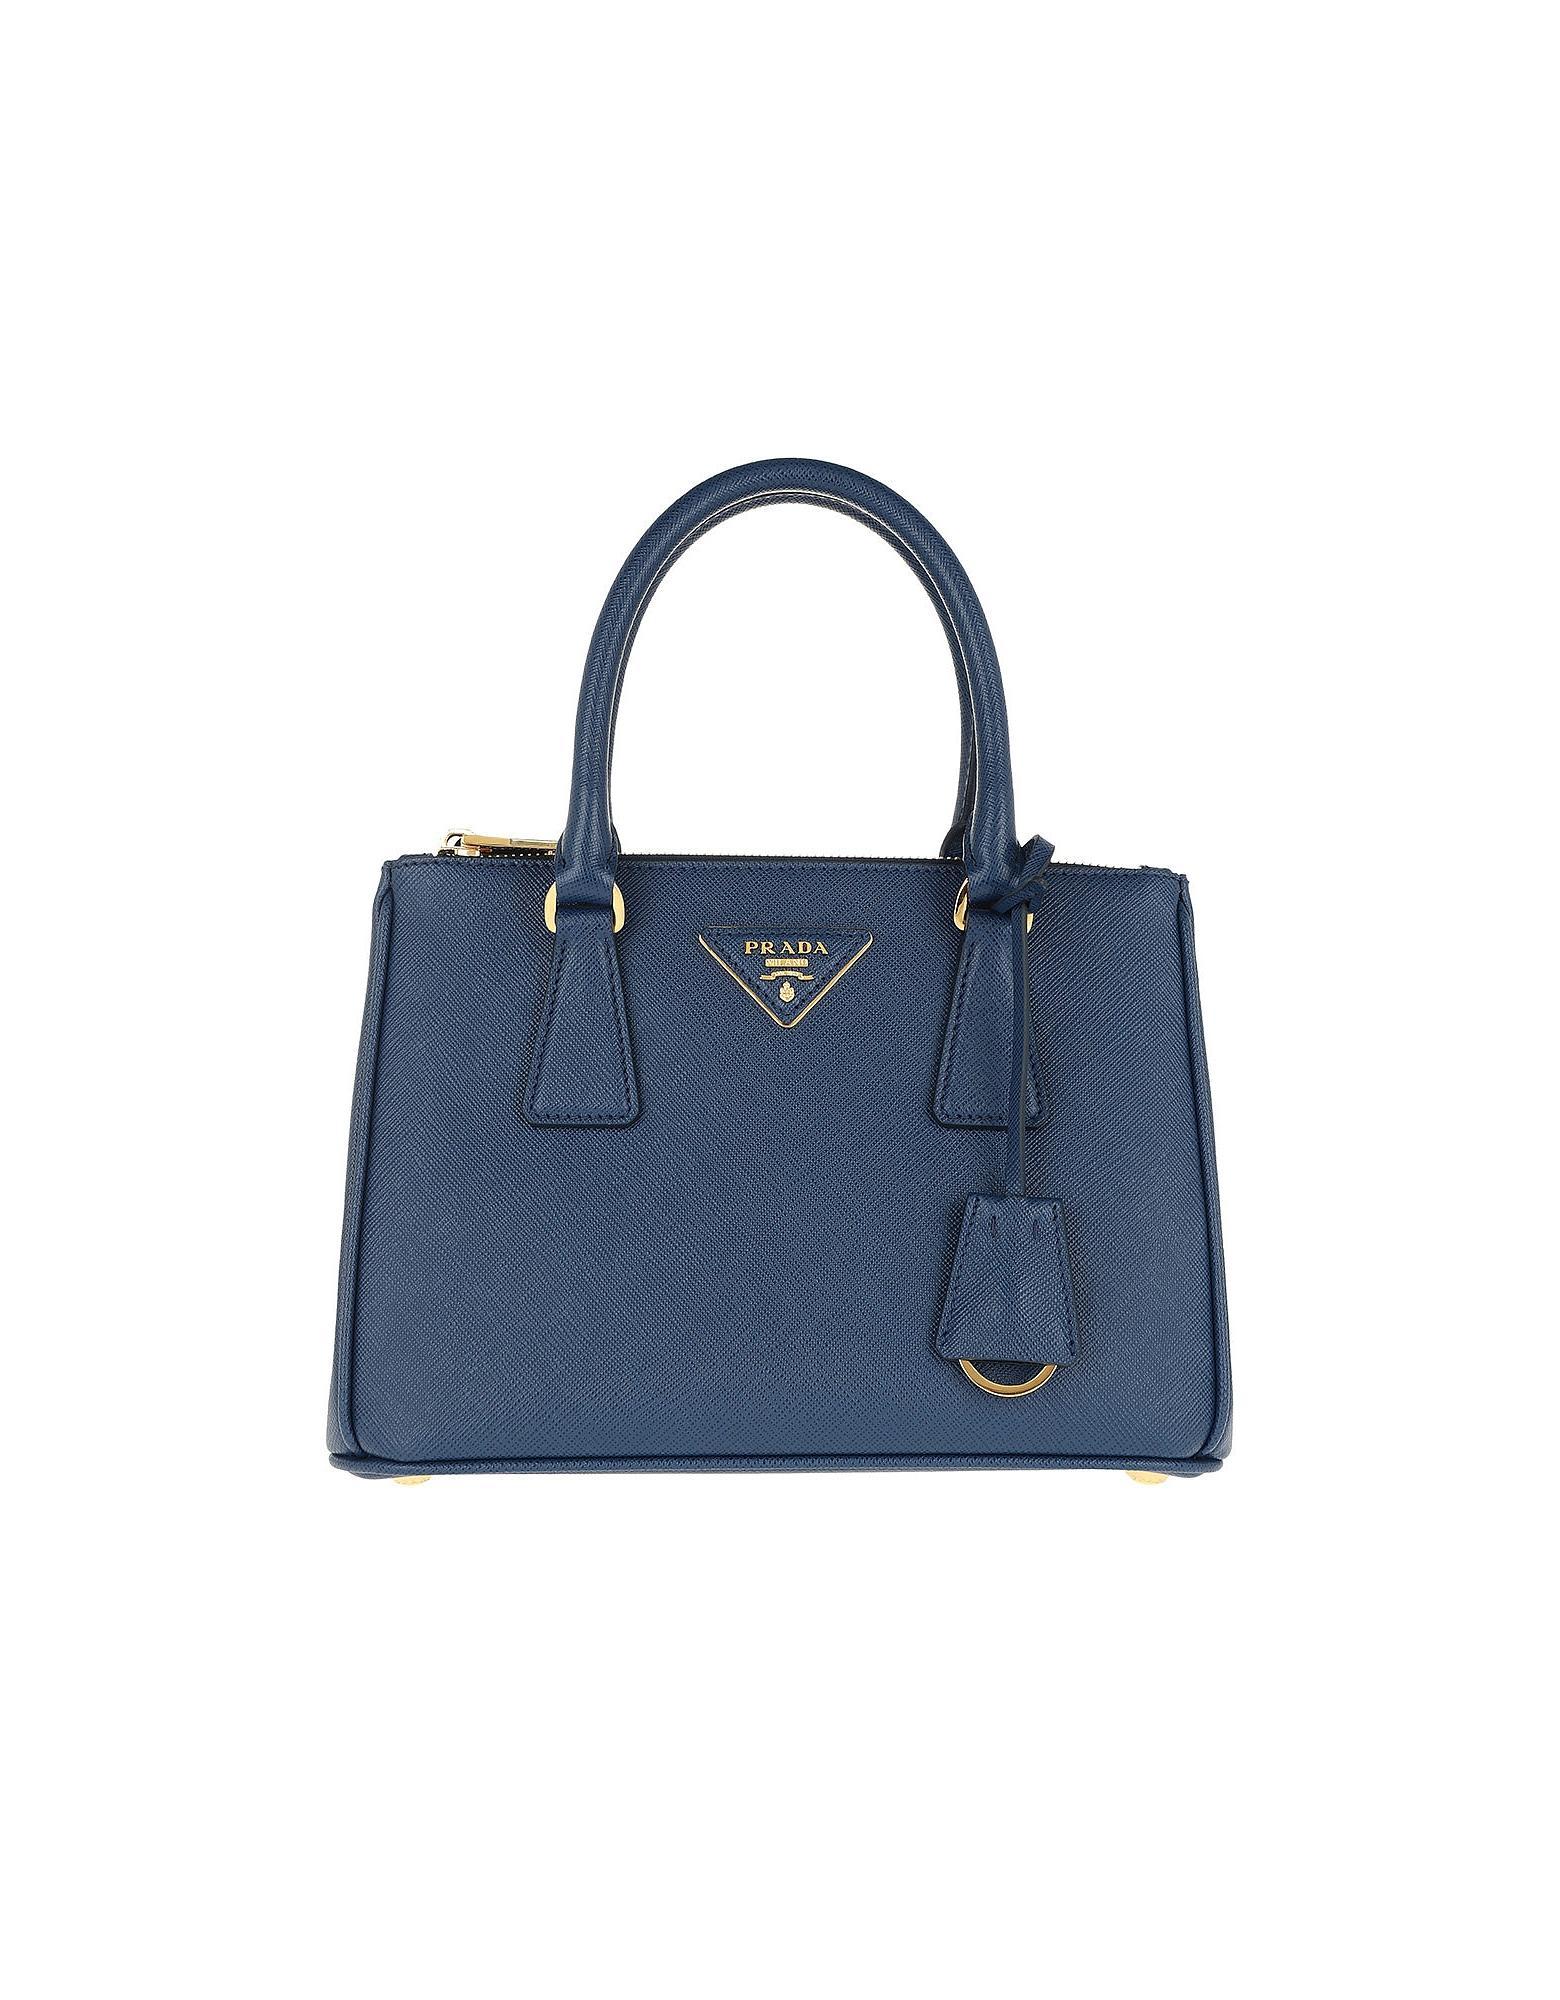 cc8b40cc0214 Prada - Galleria Tote Bag Small Bluette - Lyst. View fullscreen